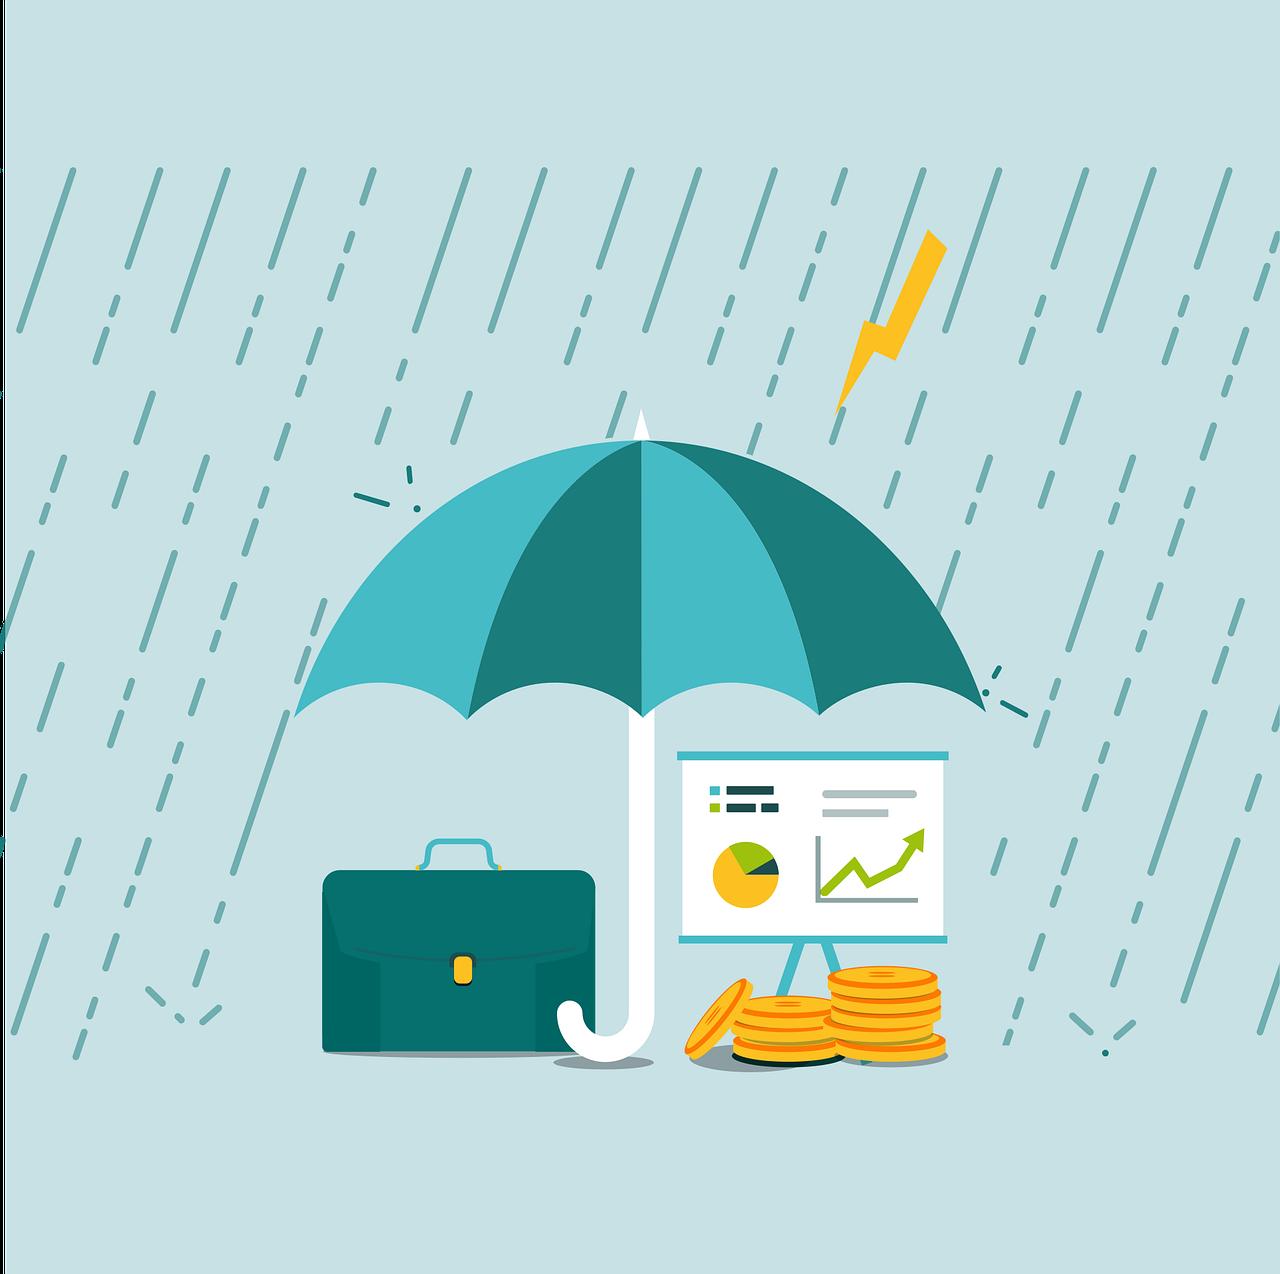 rain, business, money